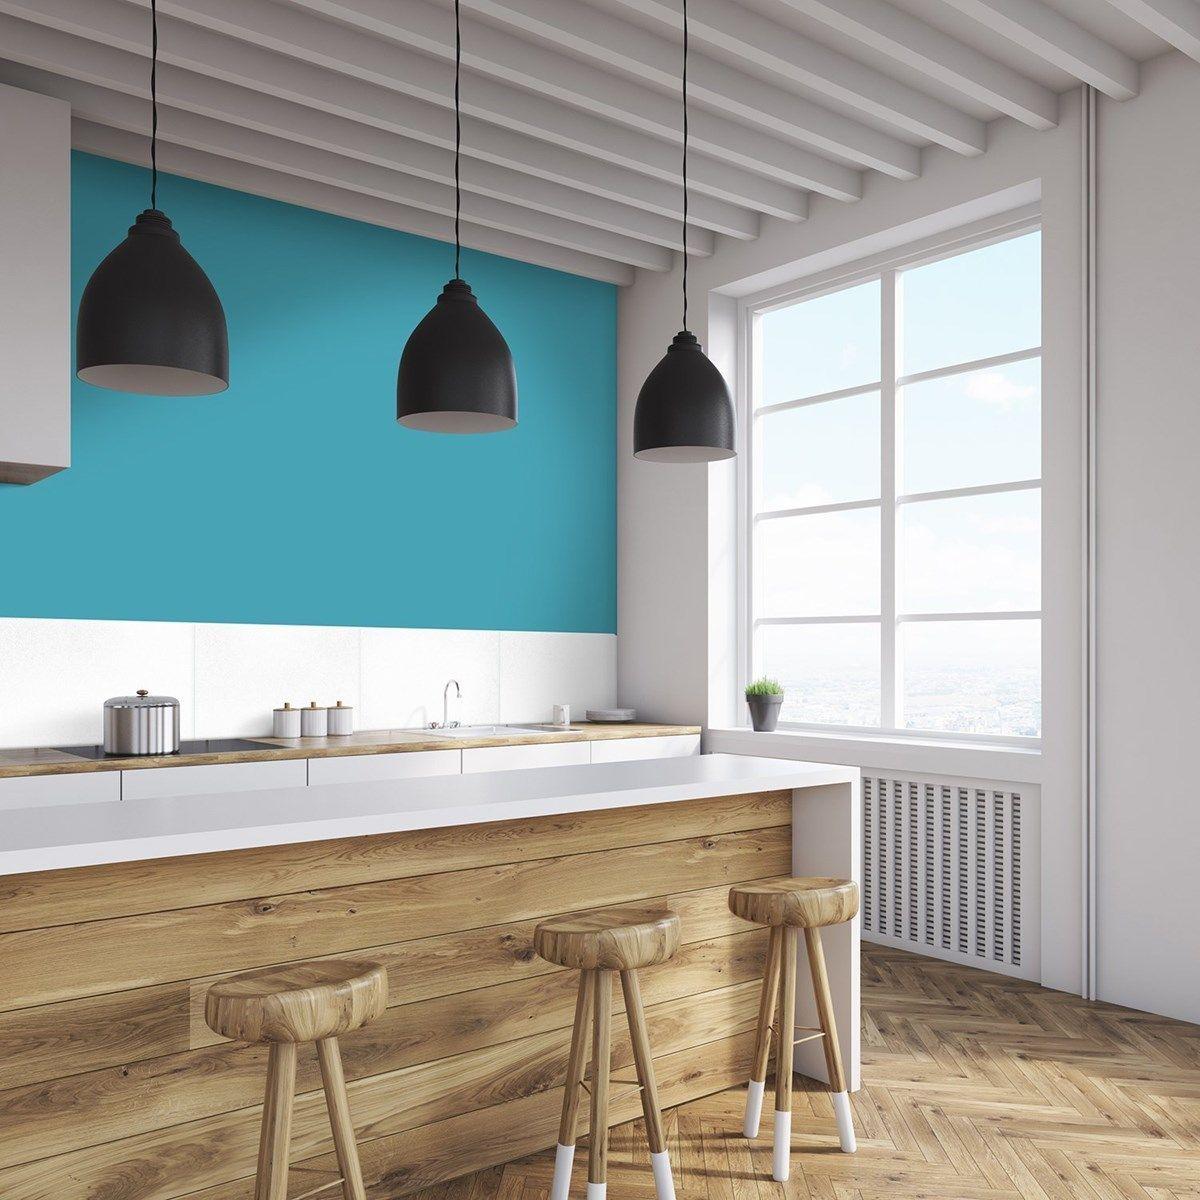 Carrelage Mural Adhesif 3d Xl Smart Tiles Blok Blanc X2 Taille